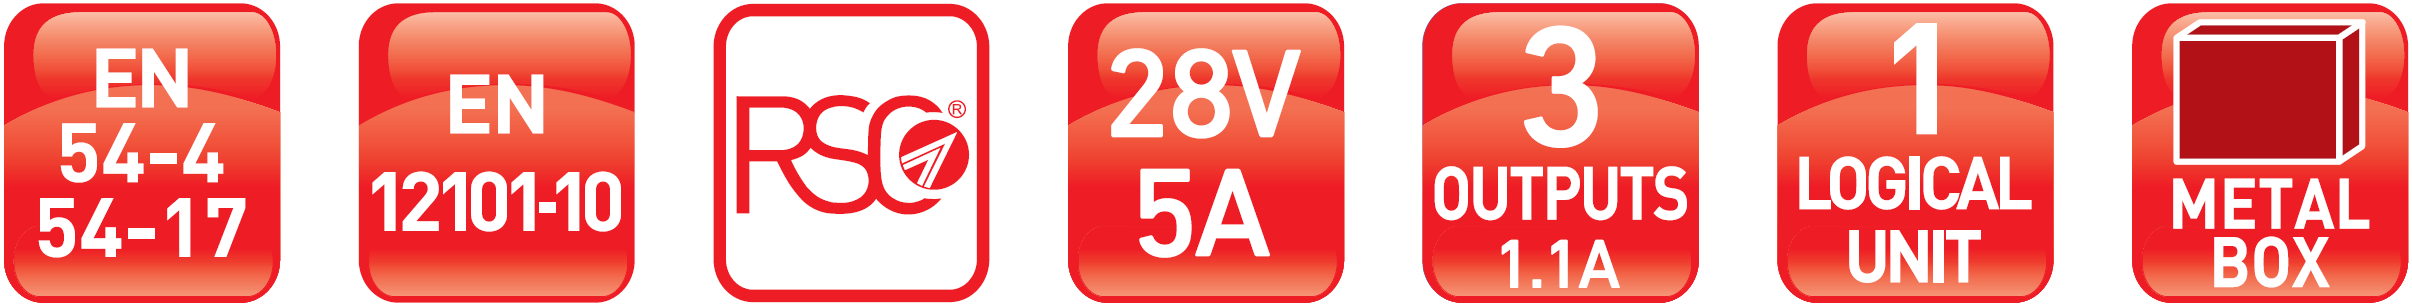 2021-01-14_17_33_25-CATALOGO_TECNOFIRE2019_1-1_ENG_PROIEZIONE_pdf_-_Adobe_Acrobat_Reader_DC.png